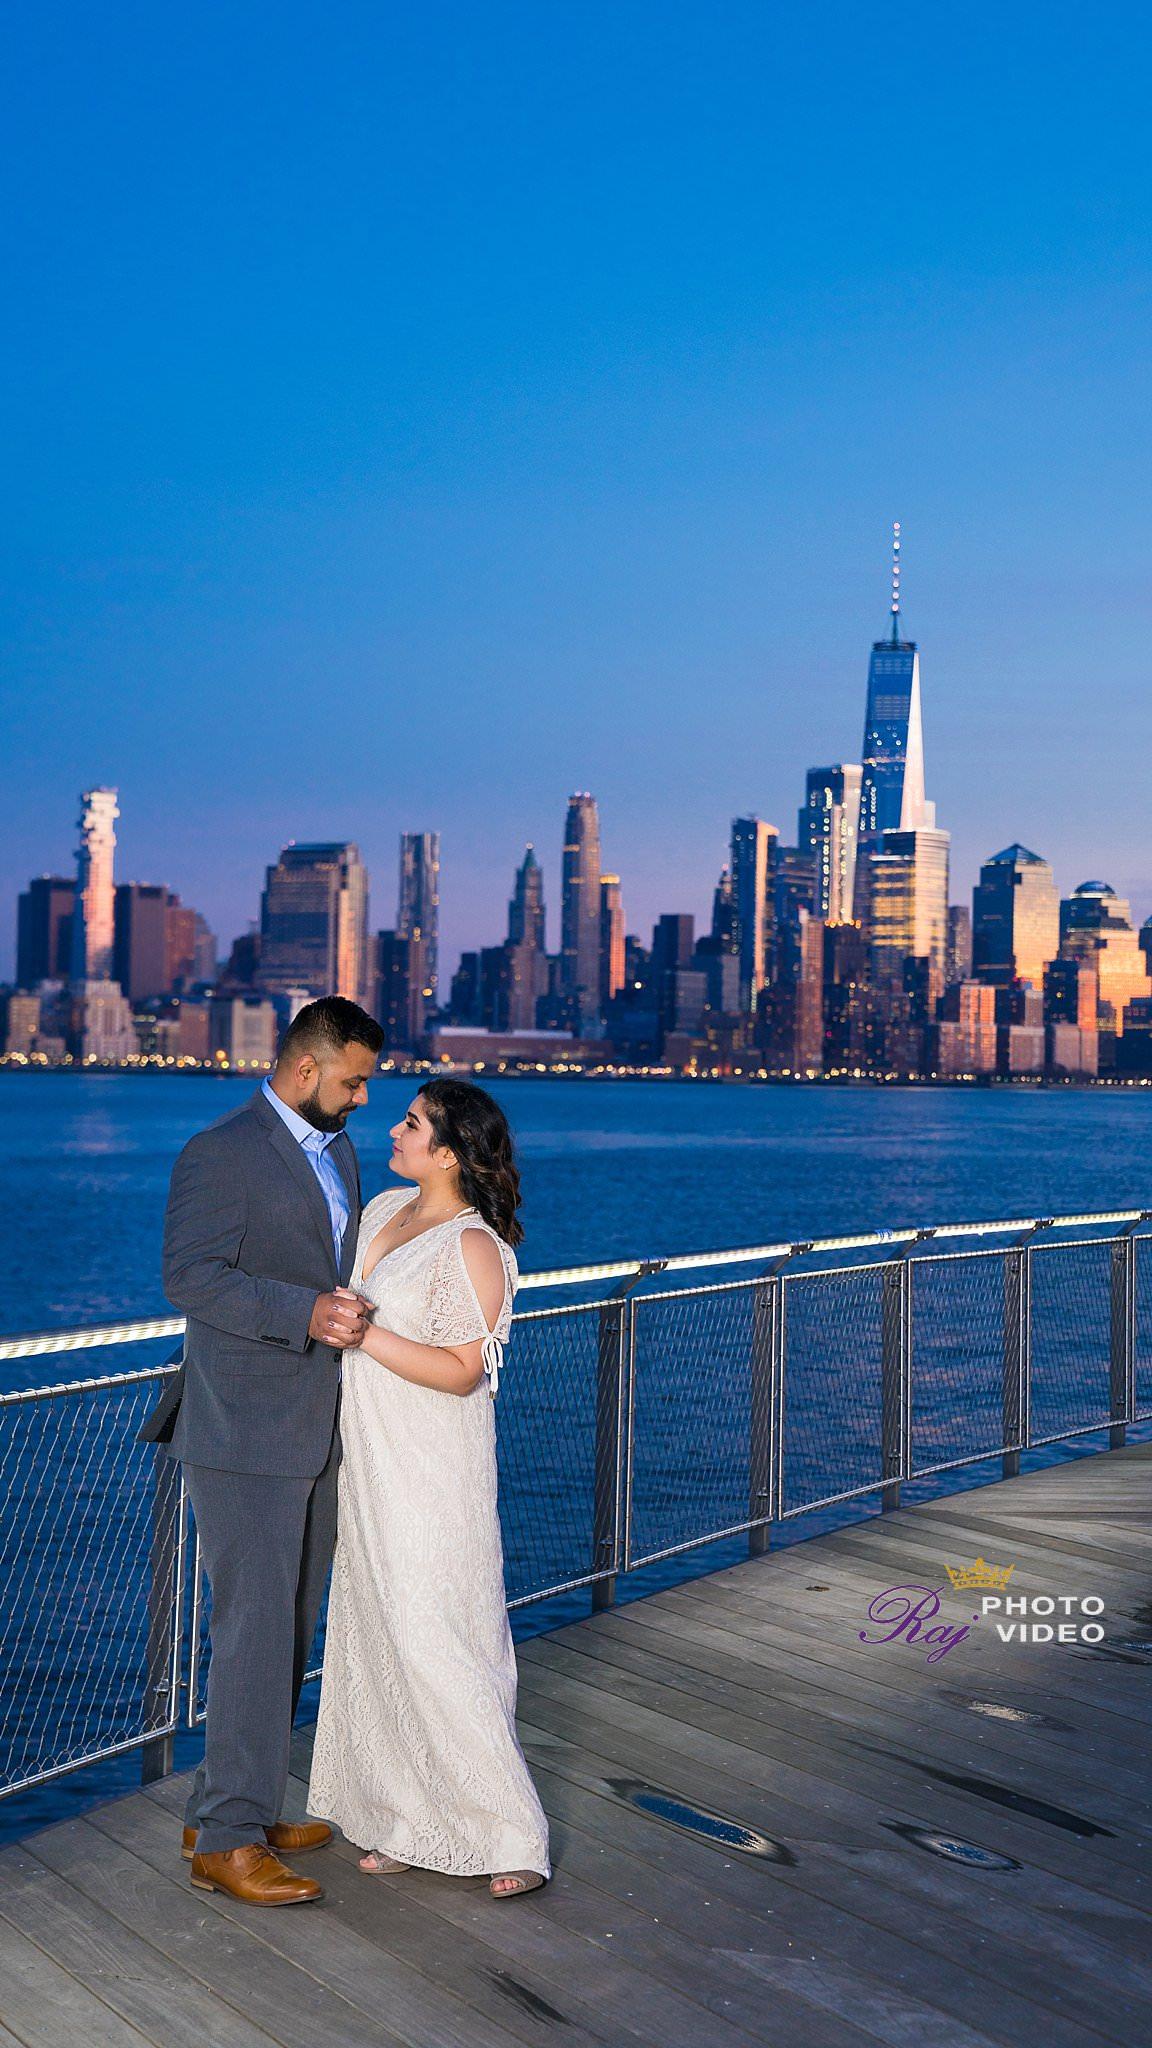 Hoboken-Pier-Engagement-Shoot-Zalak-Parag-00014_Raj_Photo_Video.jpg